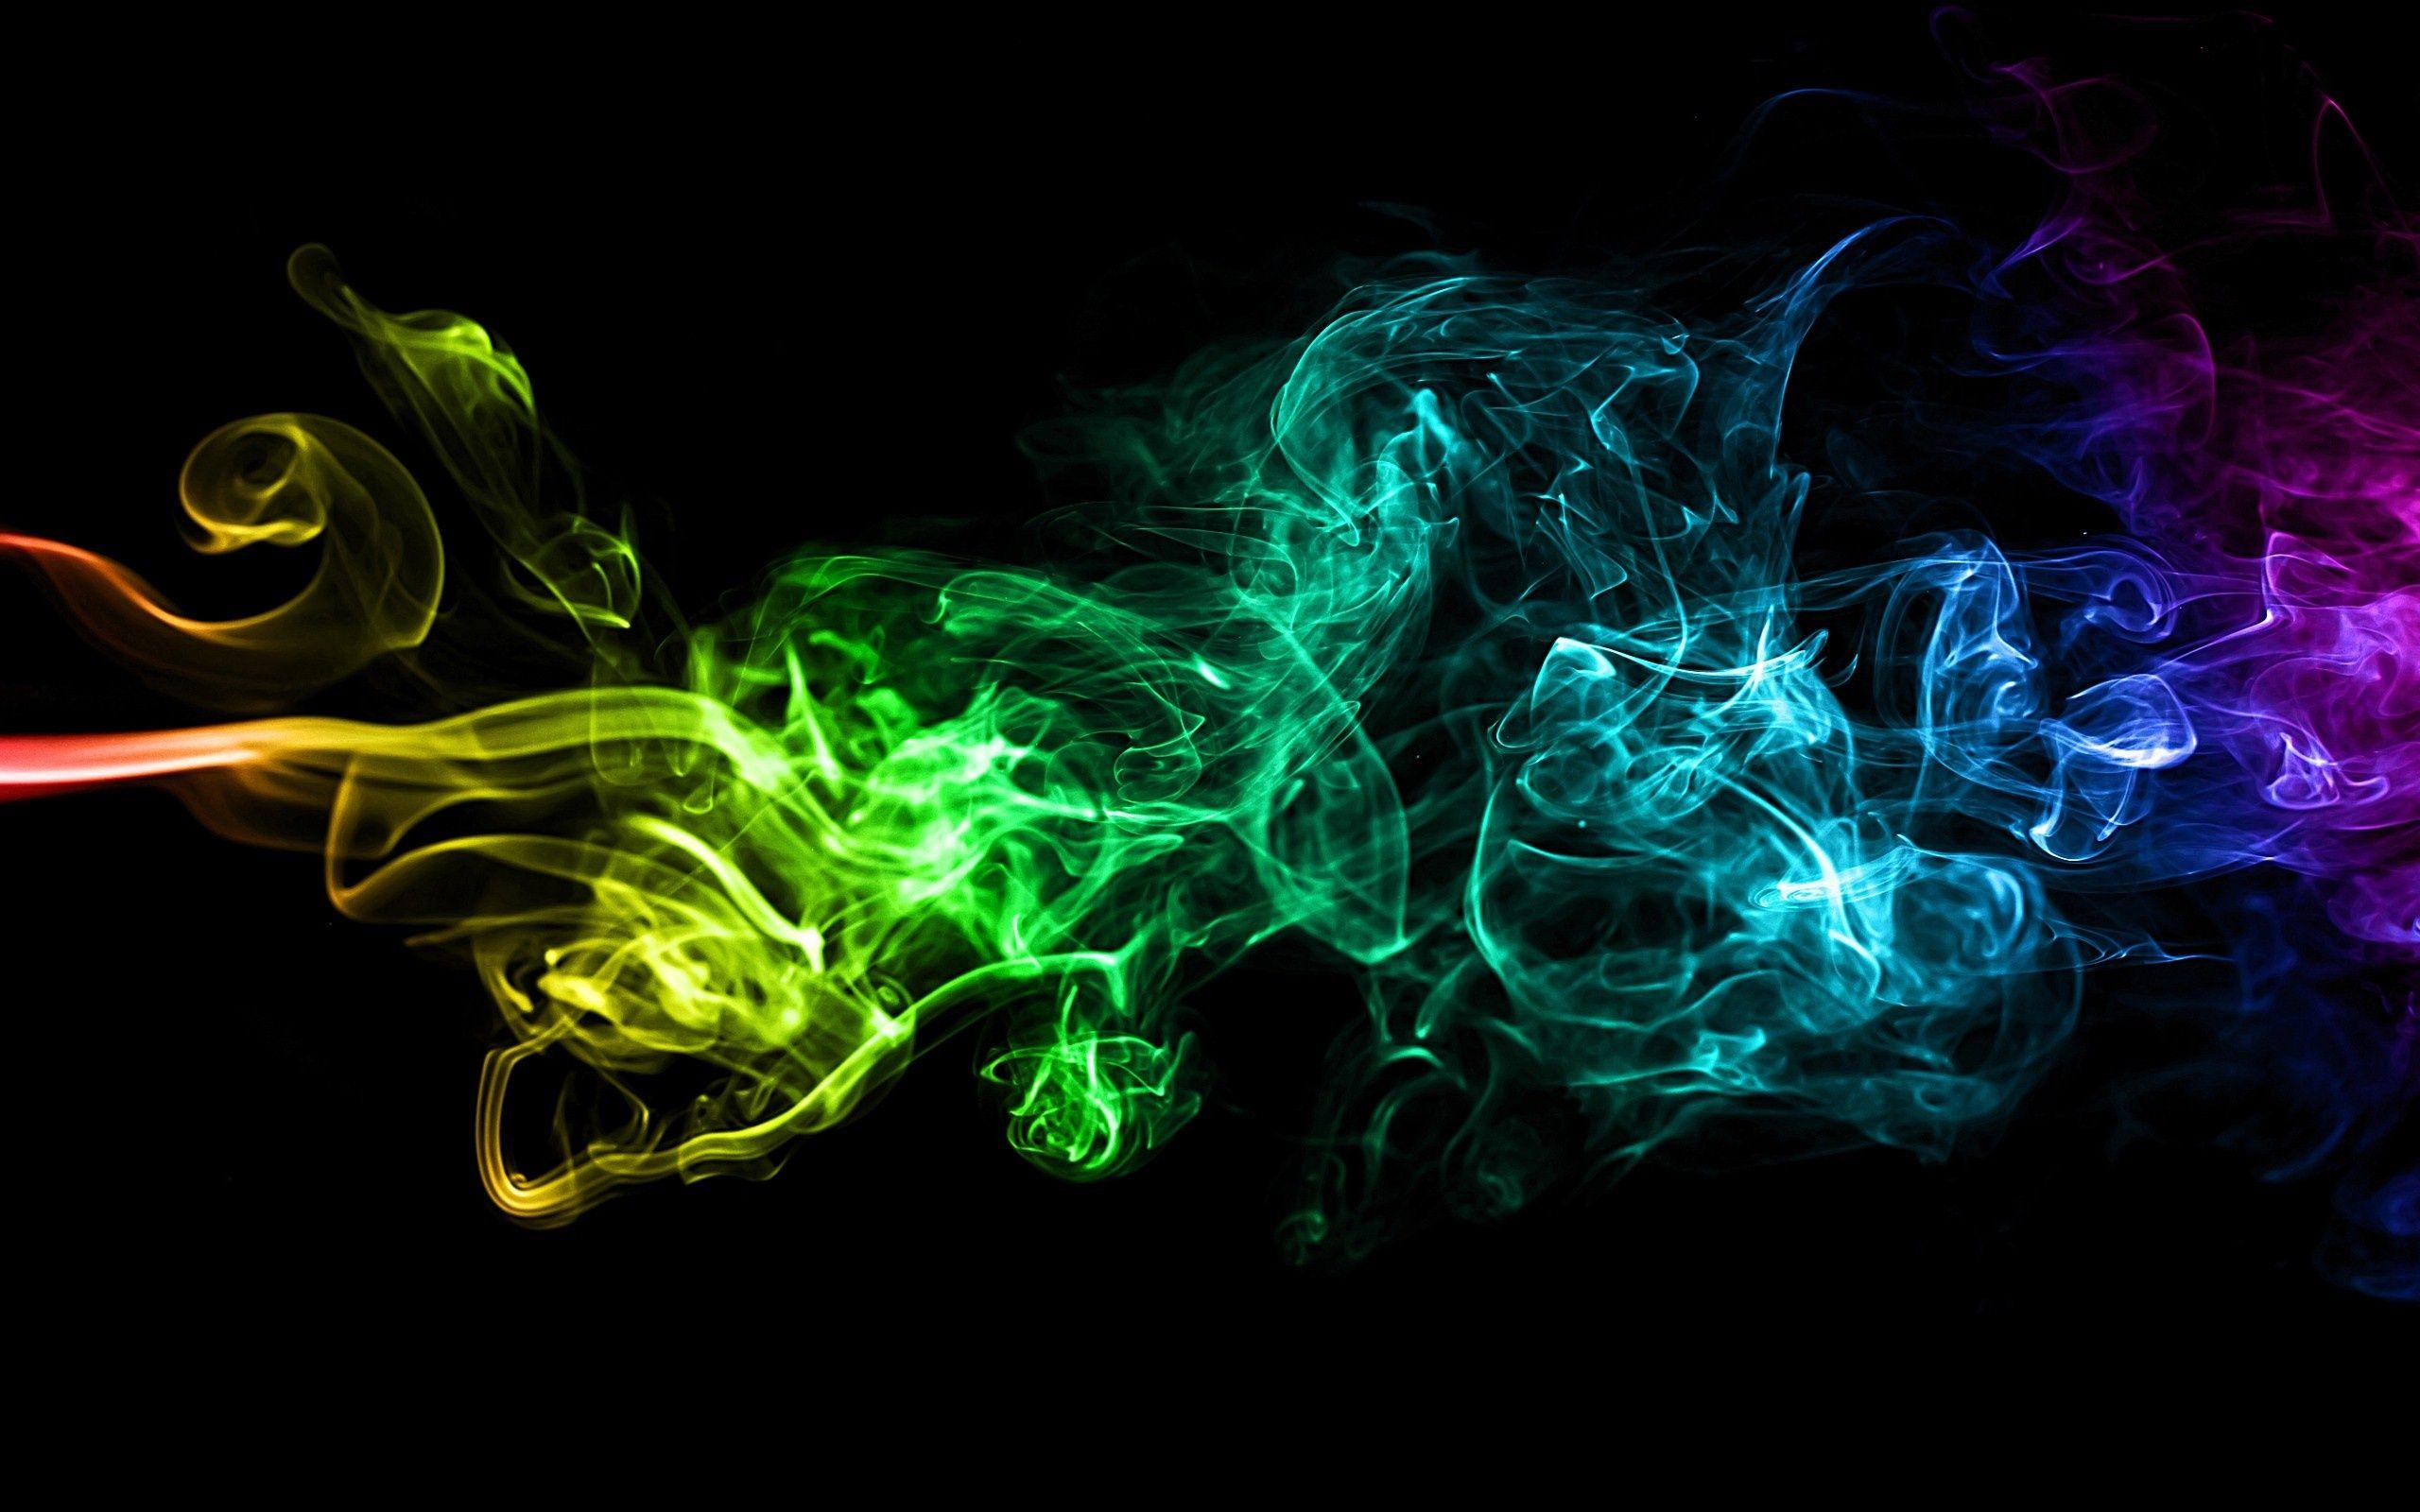 Nice Abstract Colorful Smoke Art Background Image Smoke Wallpaper Colored Smoke Smoke Art